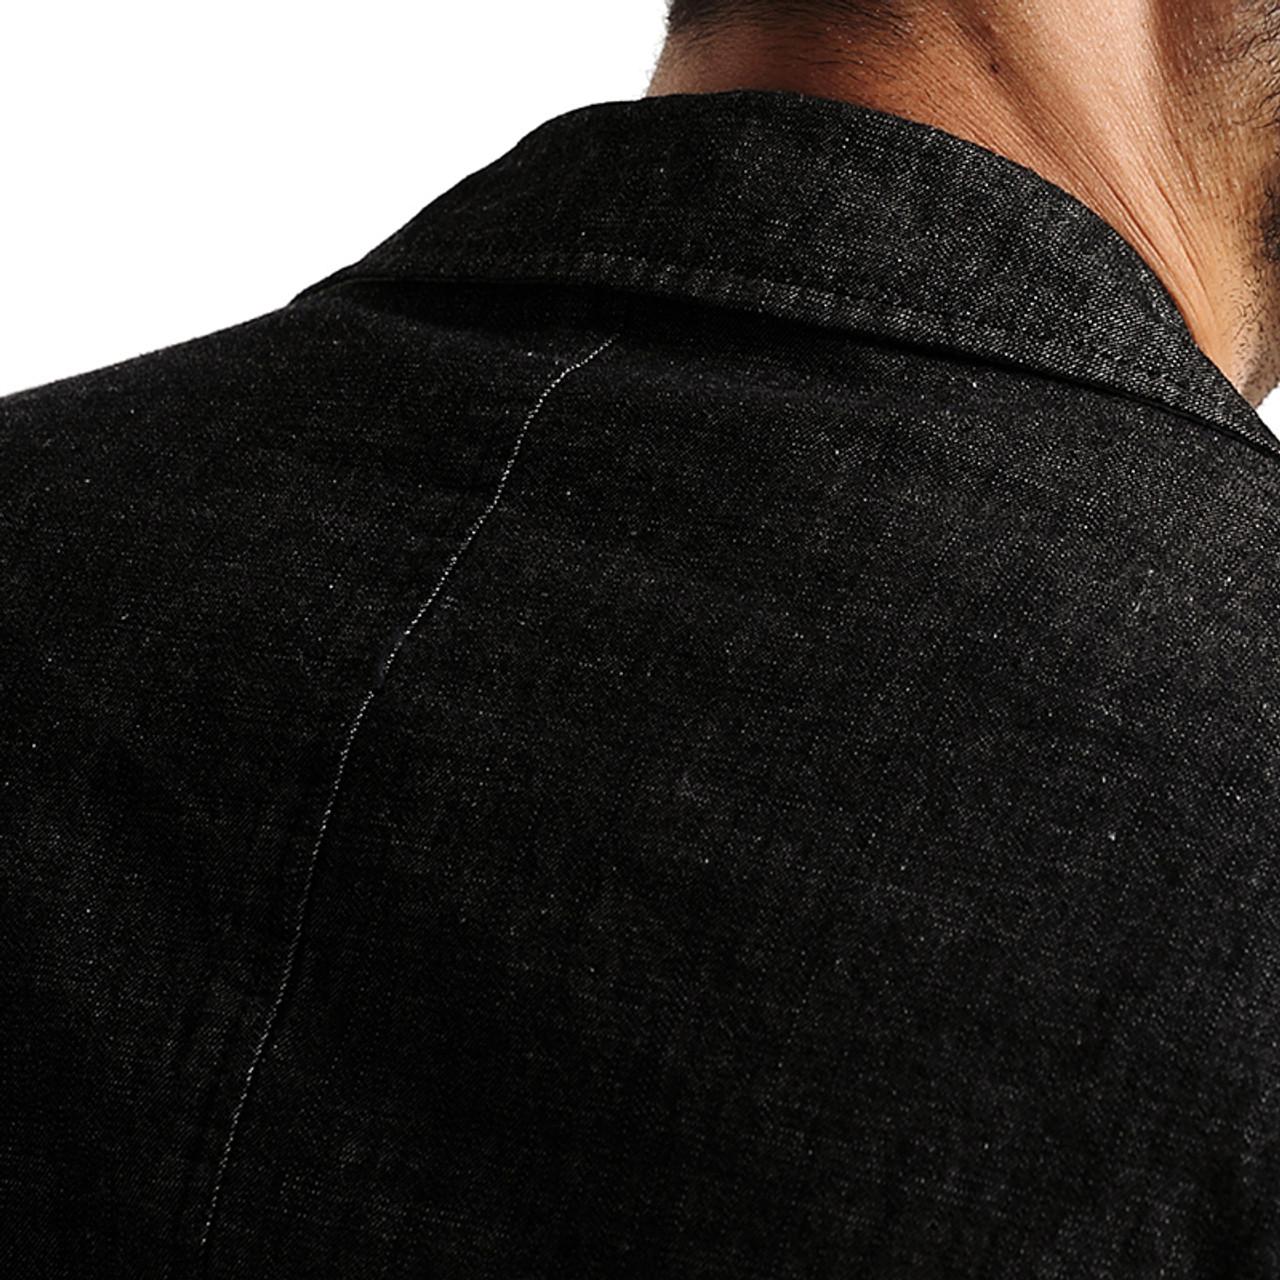 03f83f9dfe4b4 ... SIMWOOD 2018 New spring Casual Thin Blazer design Men Suits Fashion  Jacket Slim Fit 100% ...